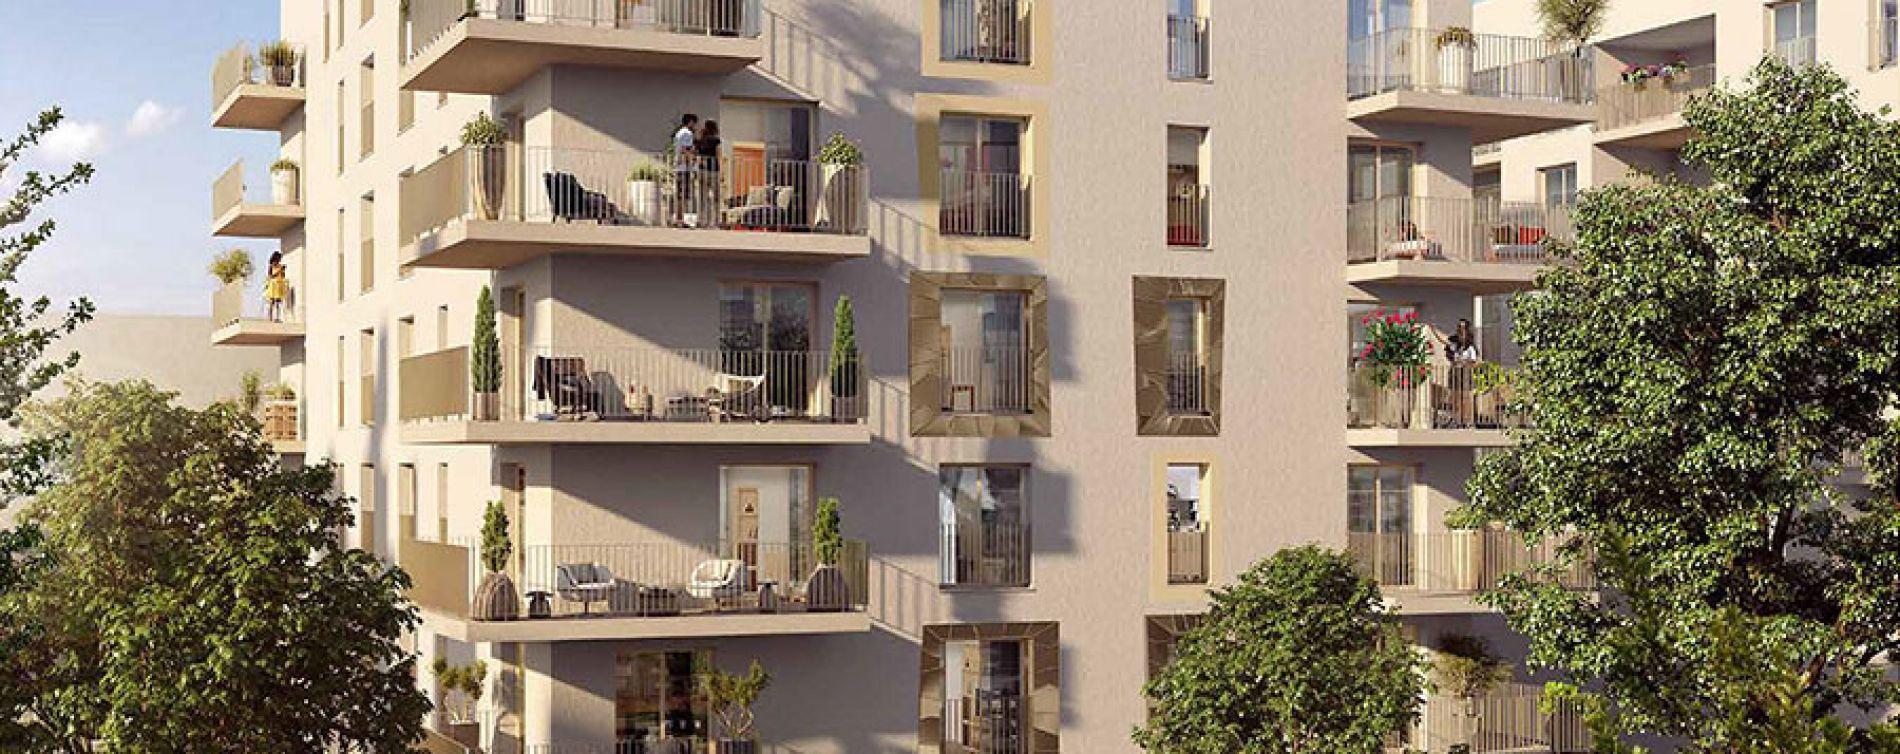 Châtenay-Malabry : programme immobilier neuve « Côté Jardin » en Loi Pinel